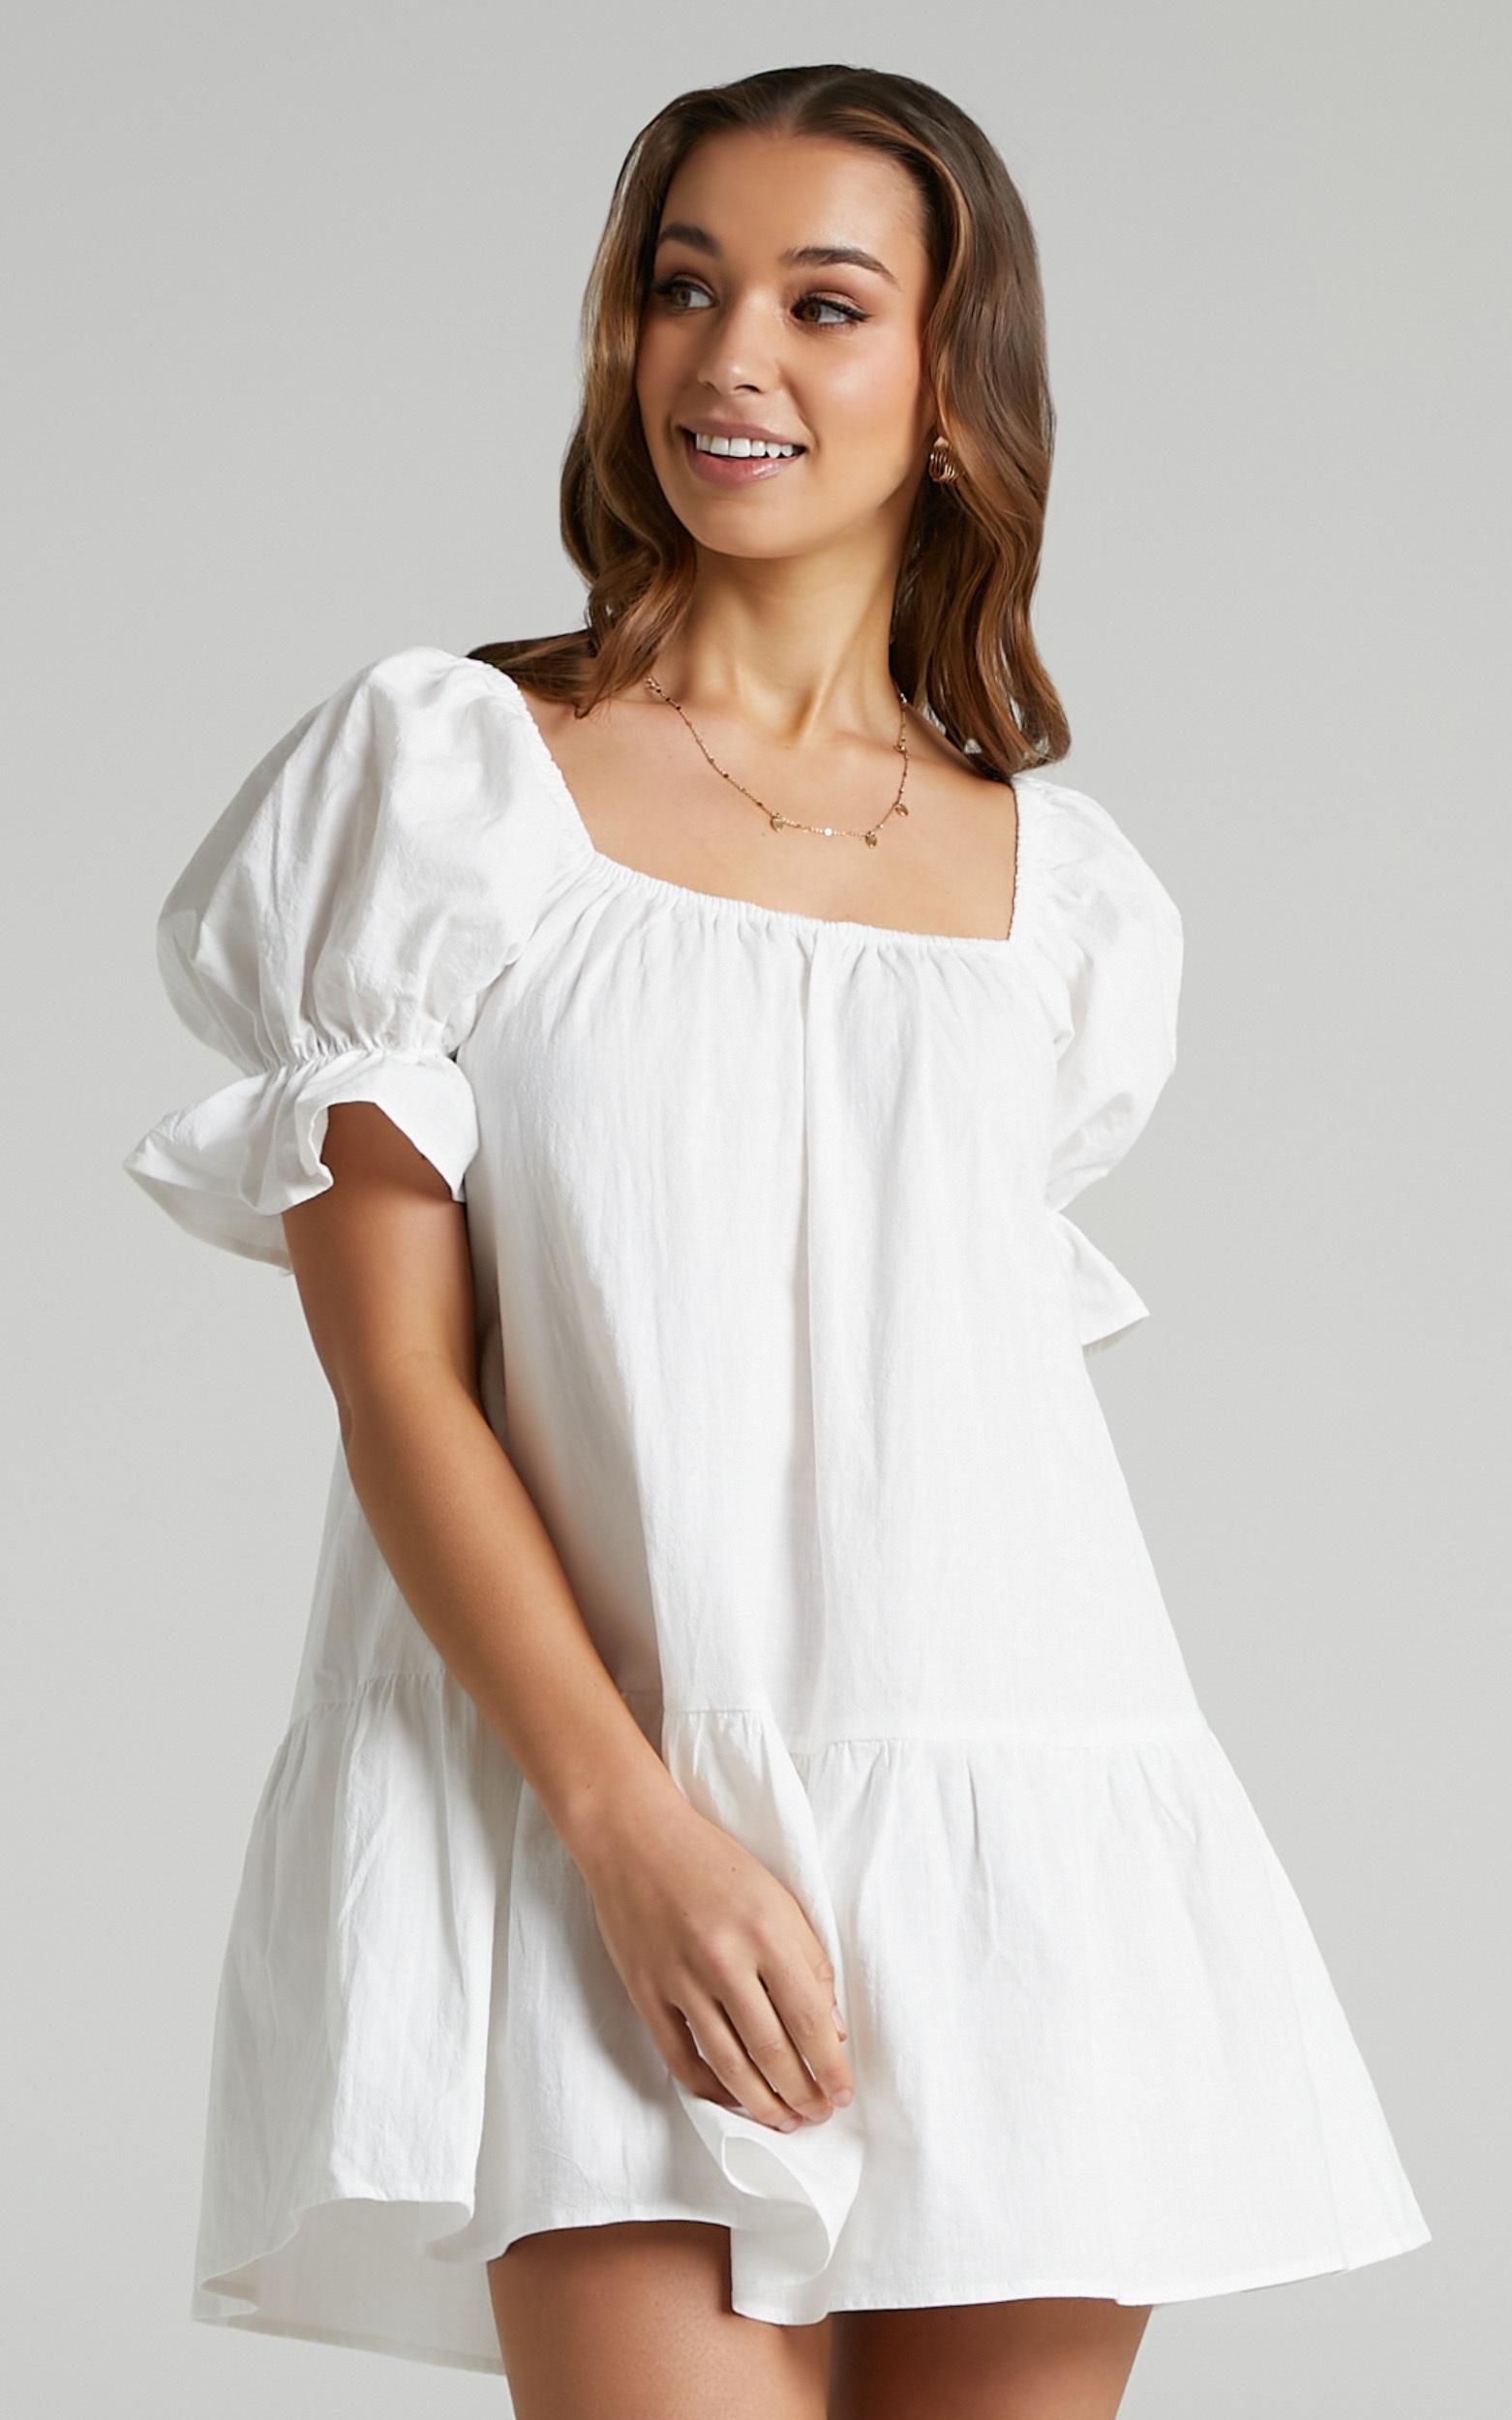 Poppy Dress in White - 06, WHT2, hi-res image number null